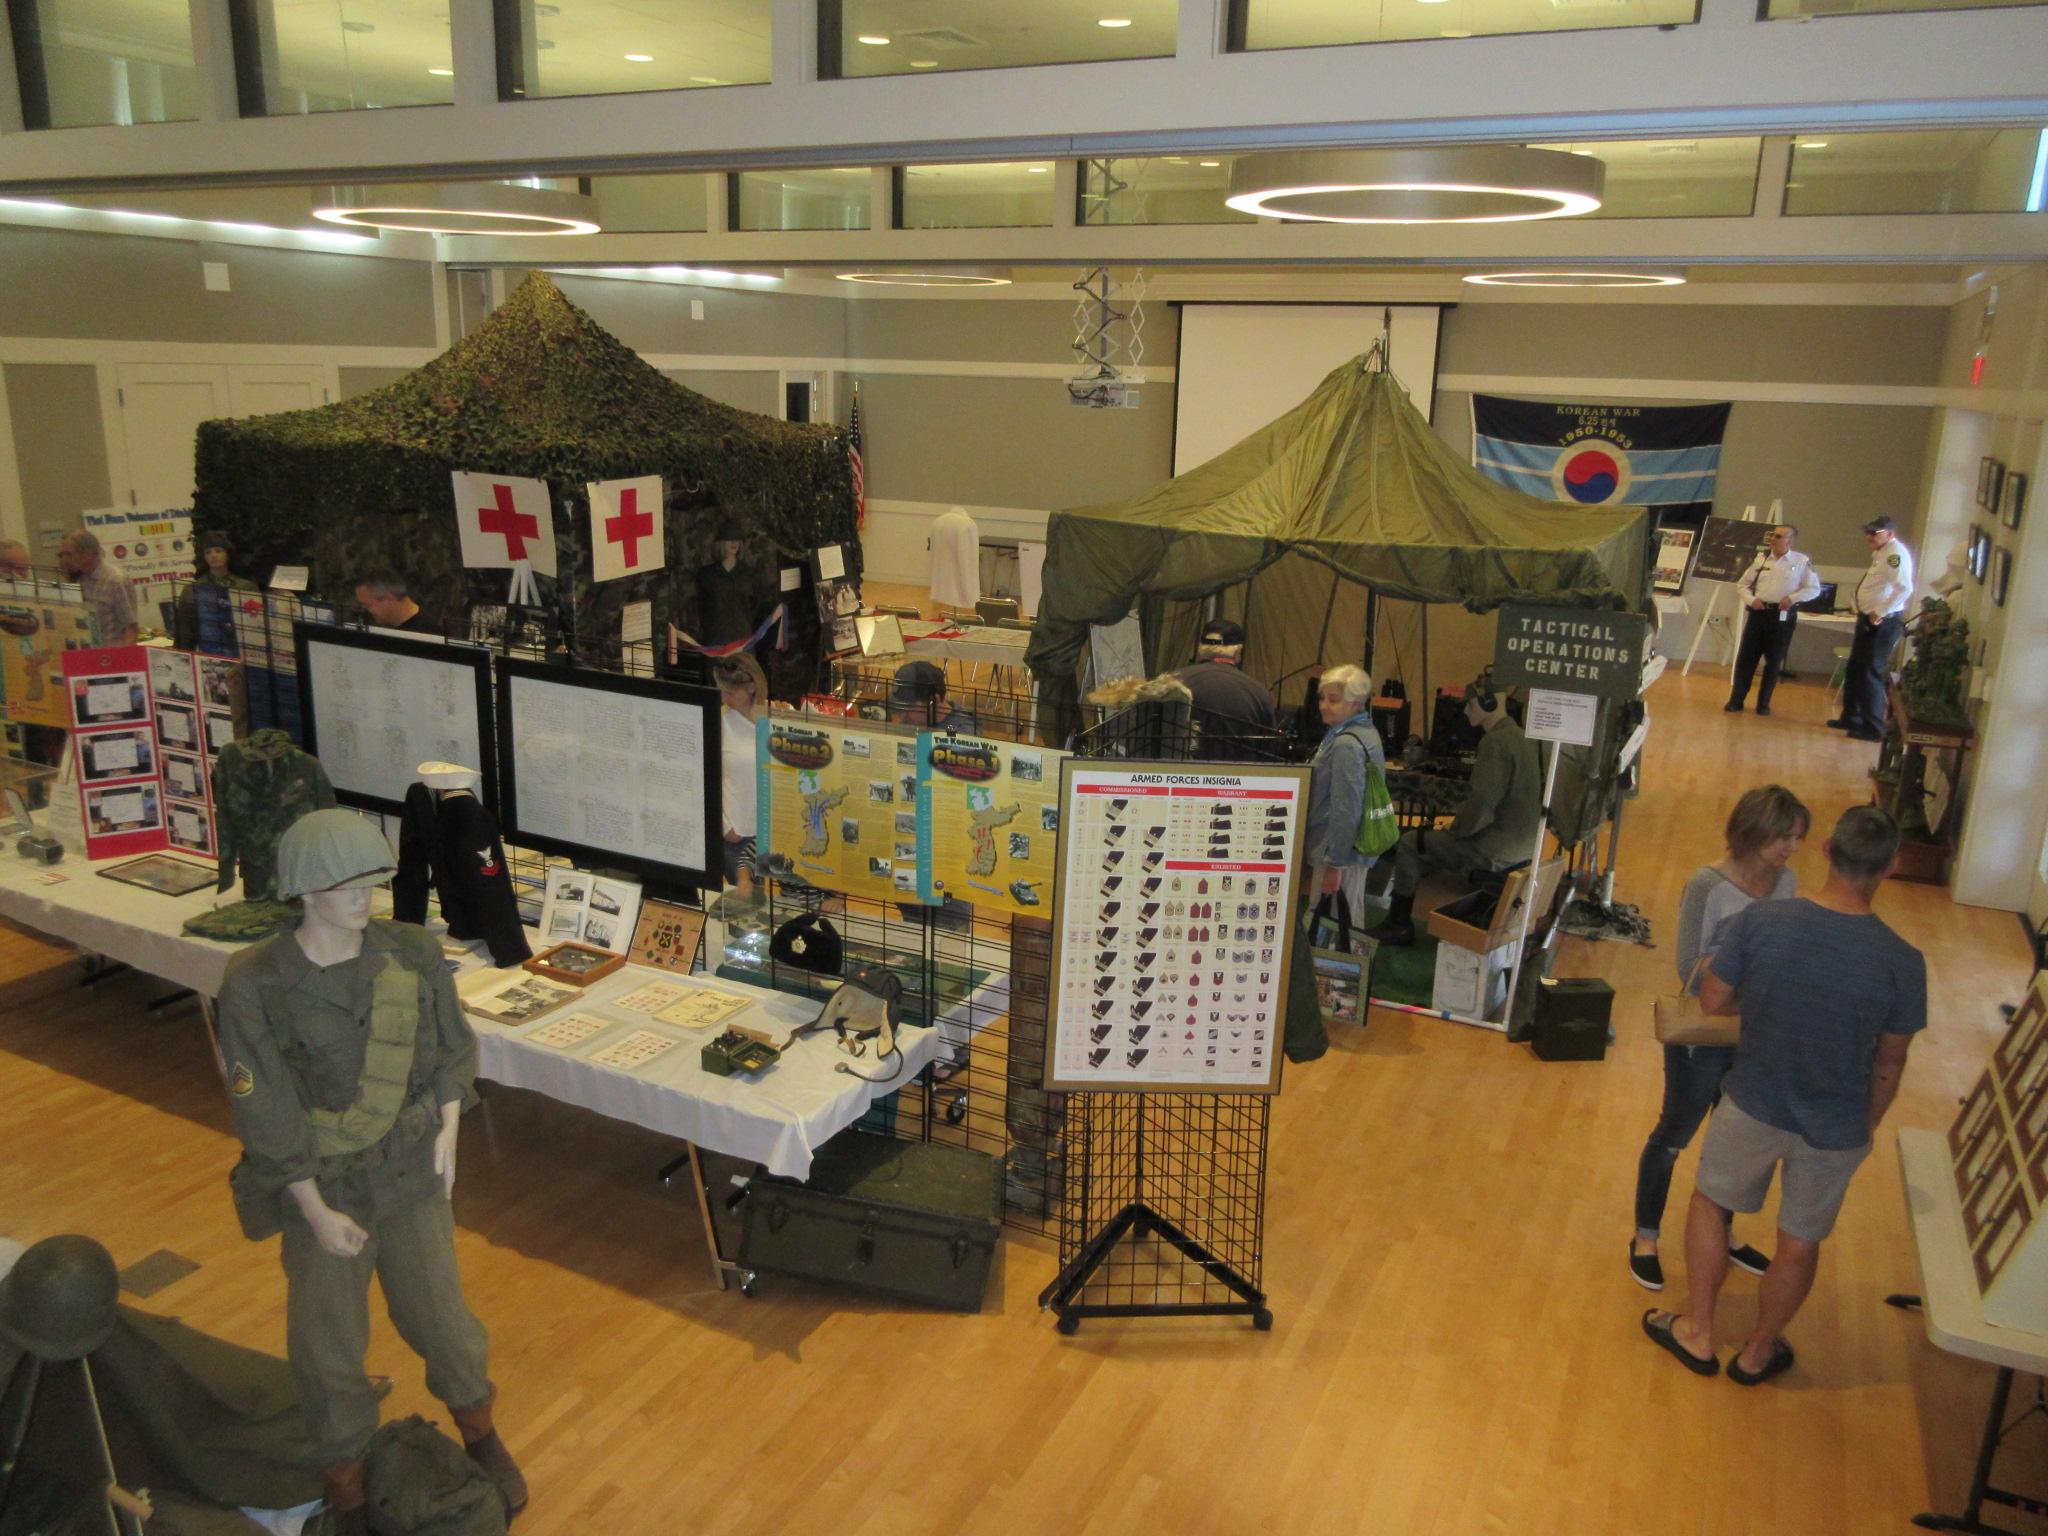 MASH Hospital tent display